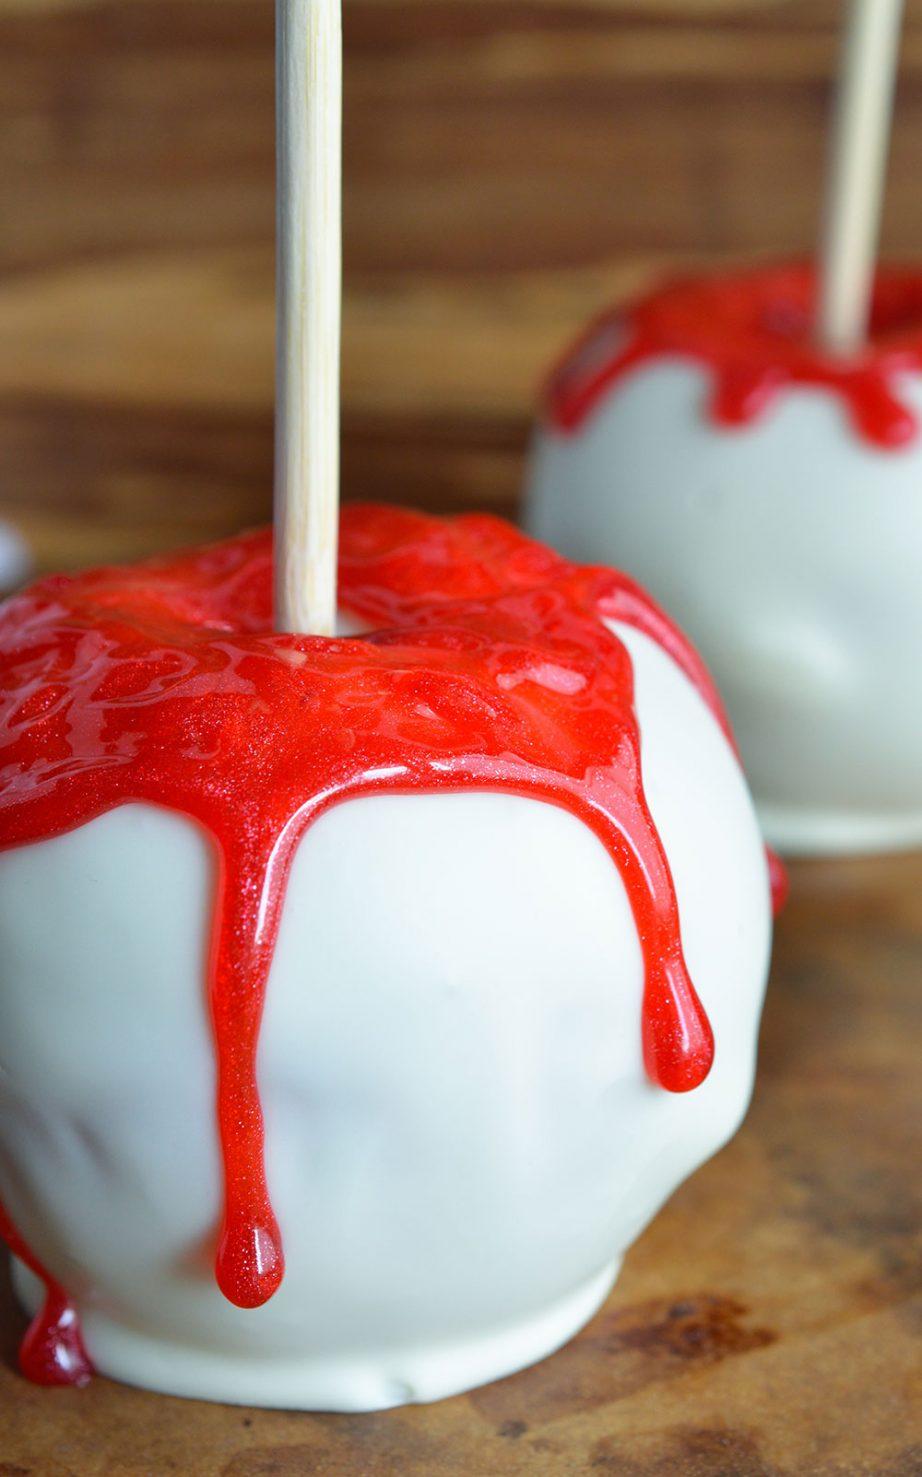 Bloody White Halloween Apples